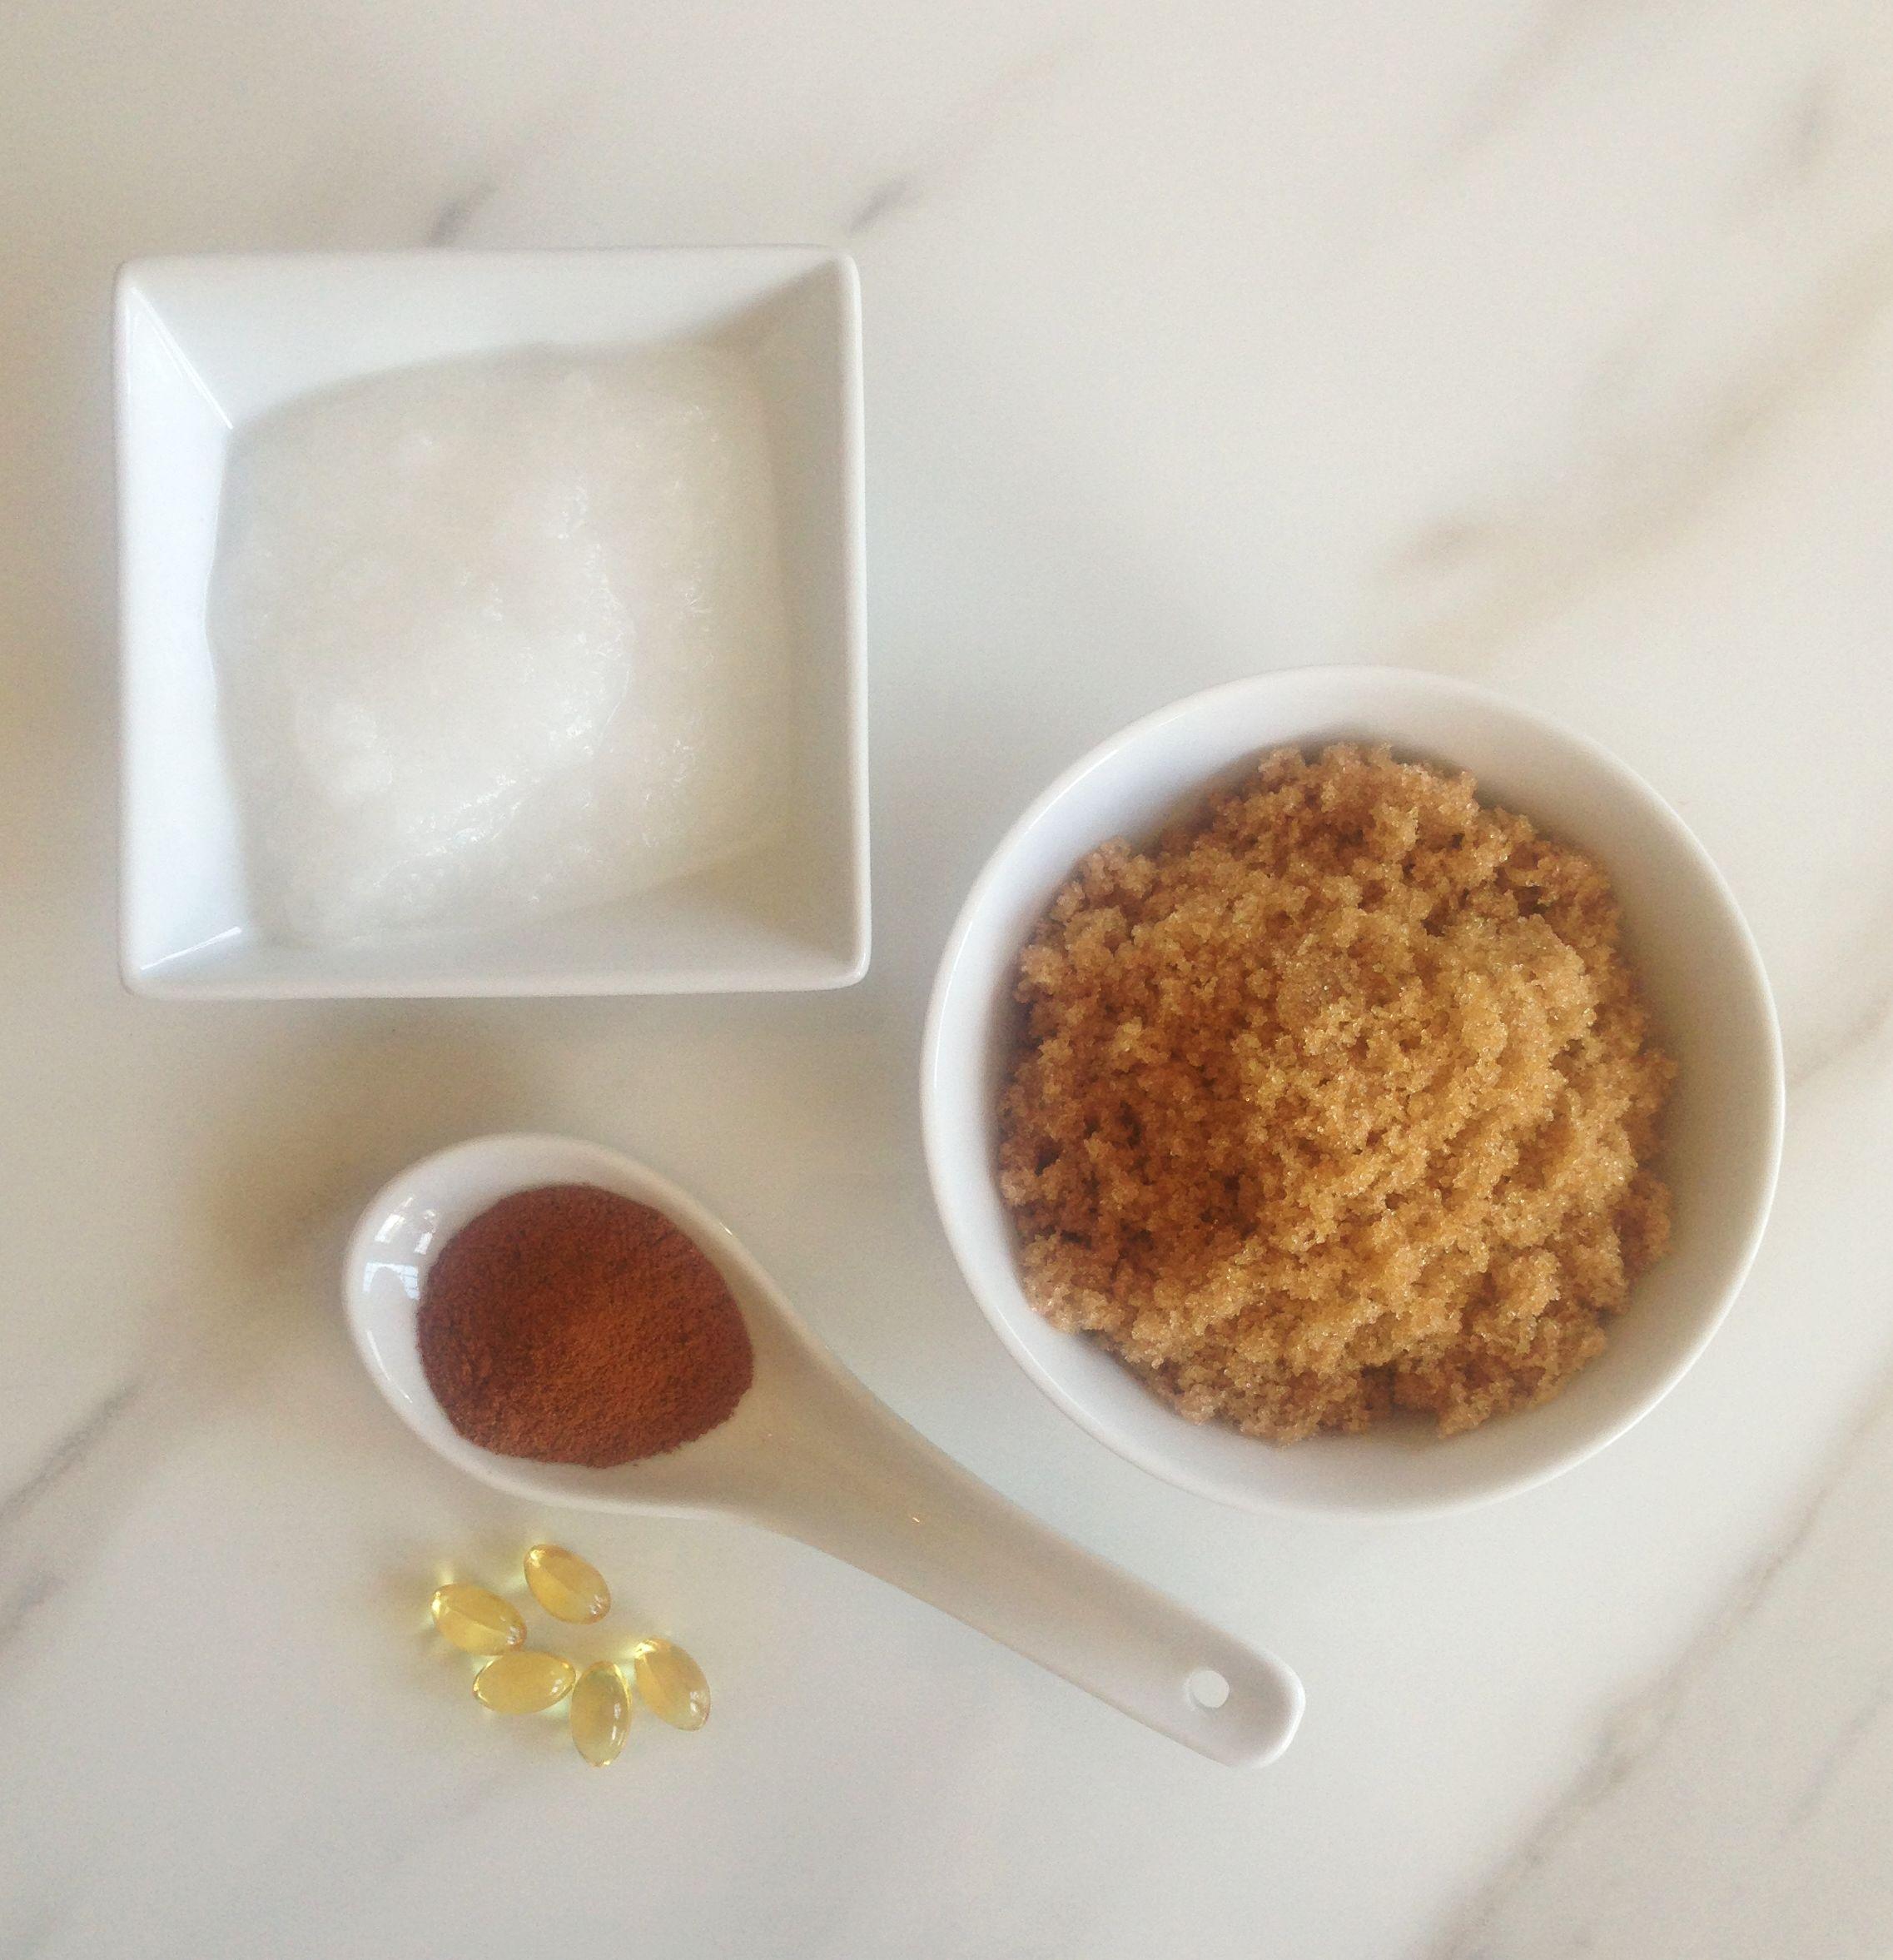 Homemade Coconut Oil Brown Sugar Scrub